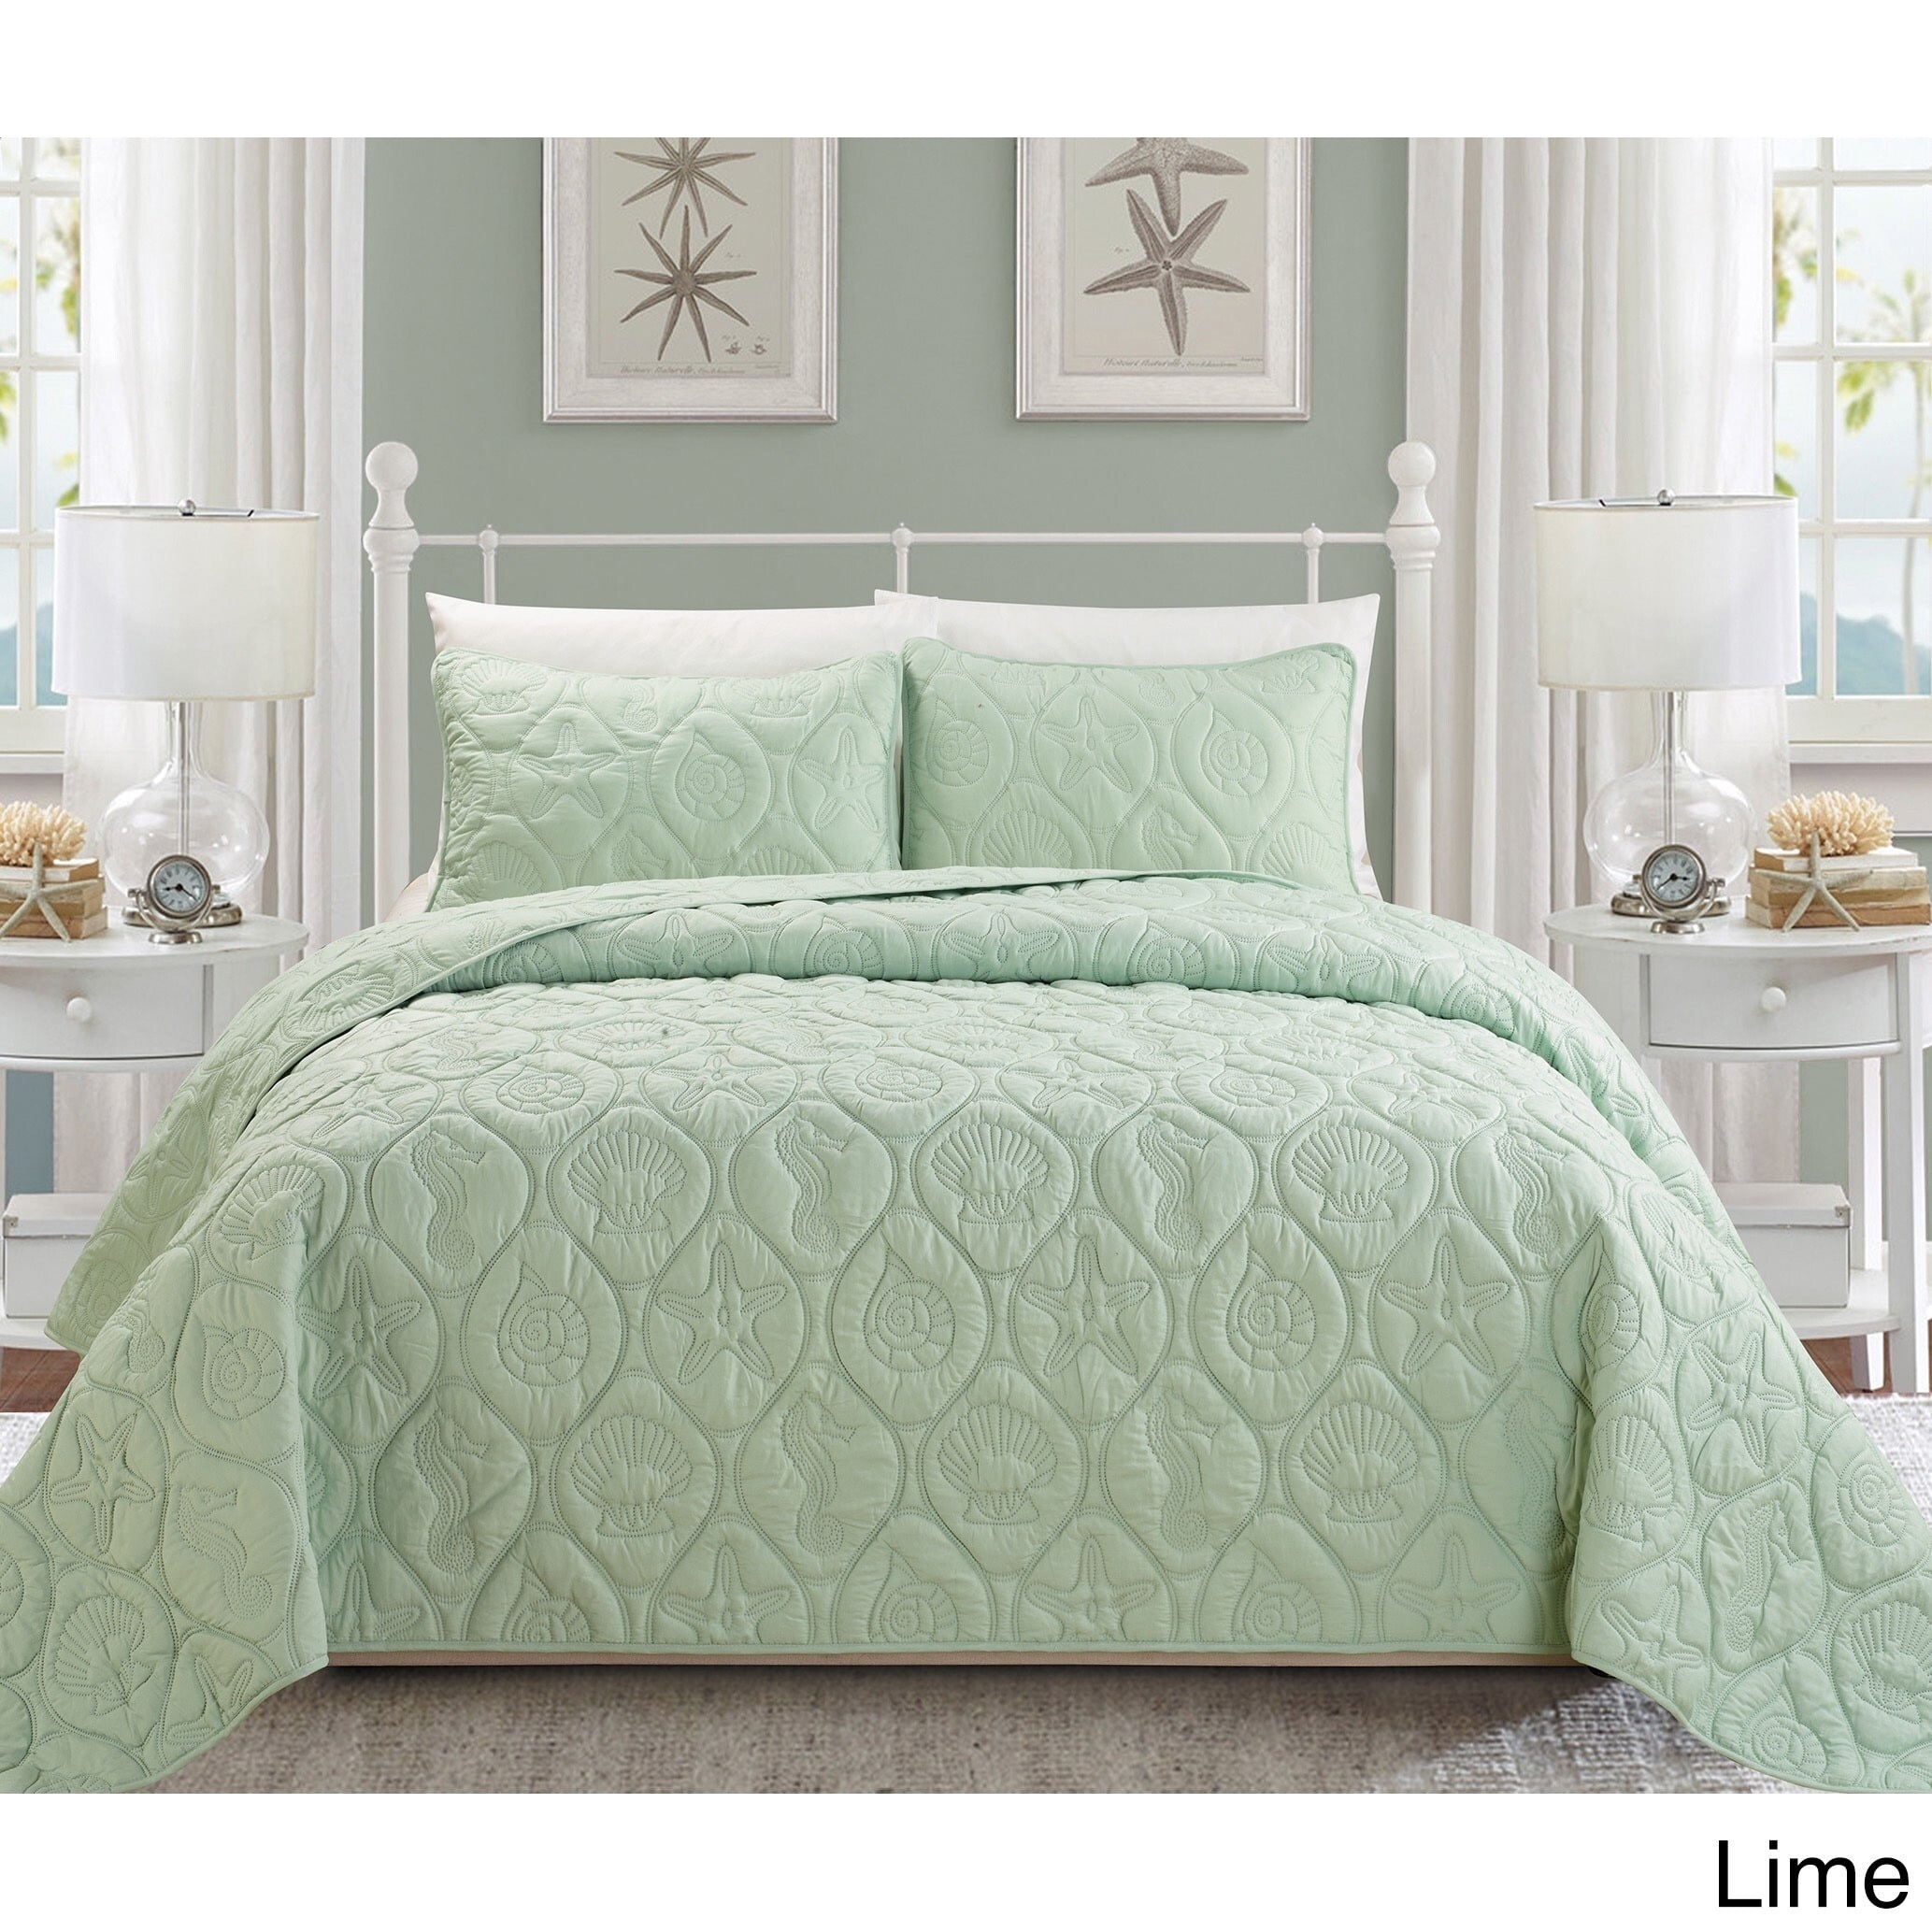 EverRouge Oversized Coral 3-piece Bedspread Set (Lime - Q...